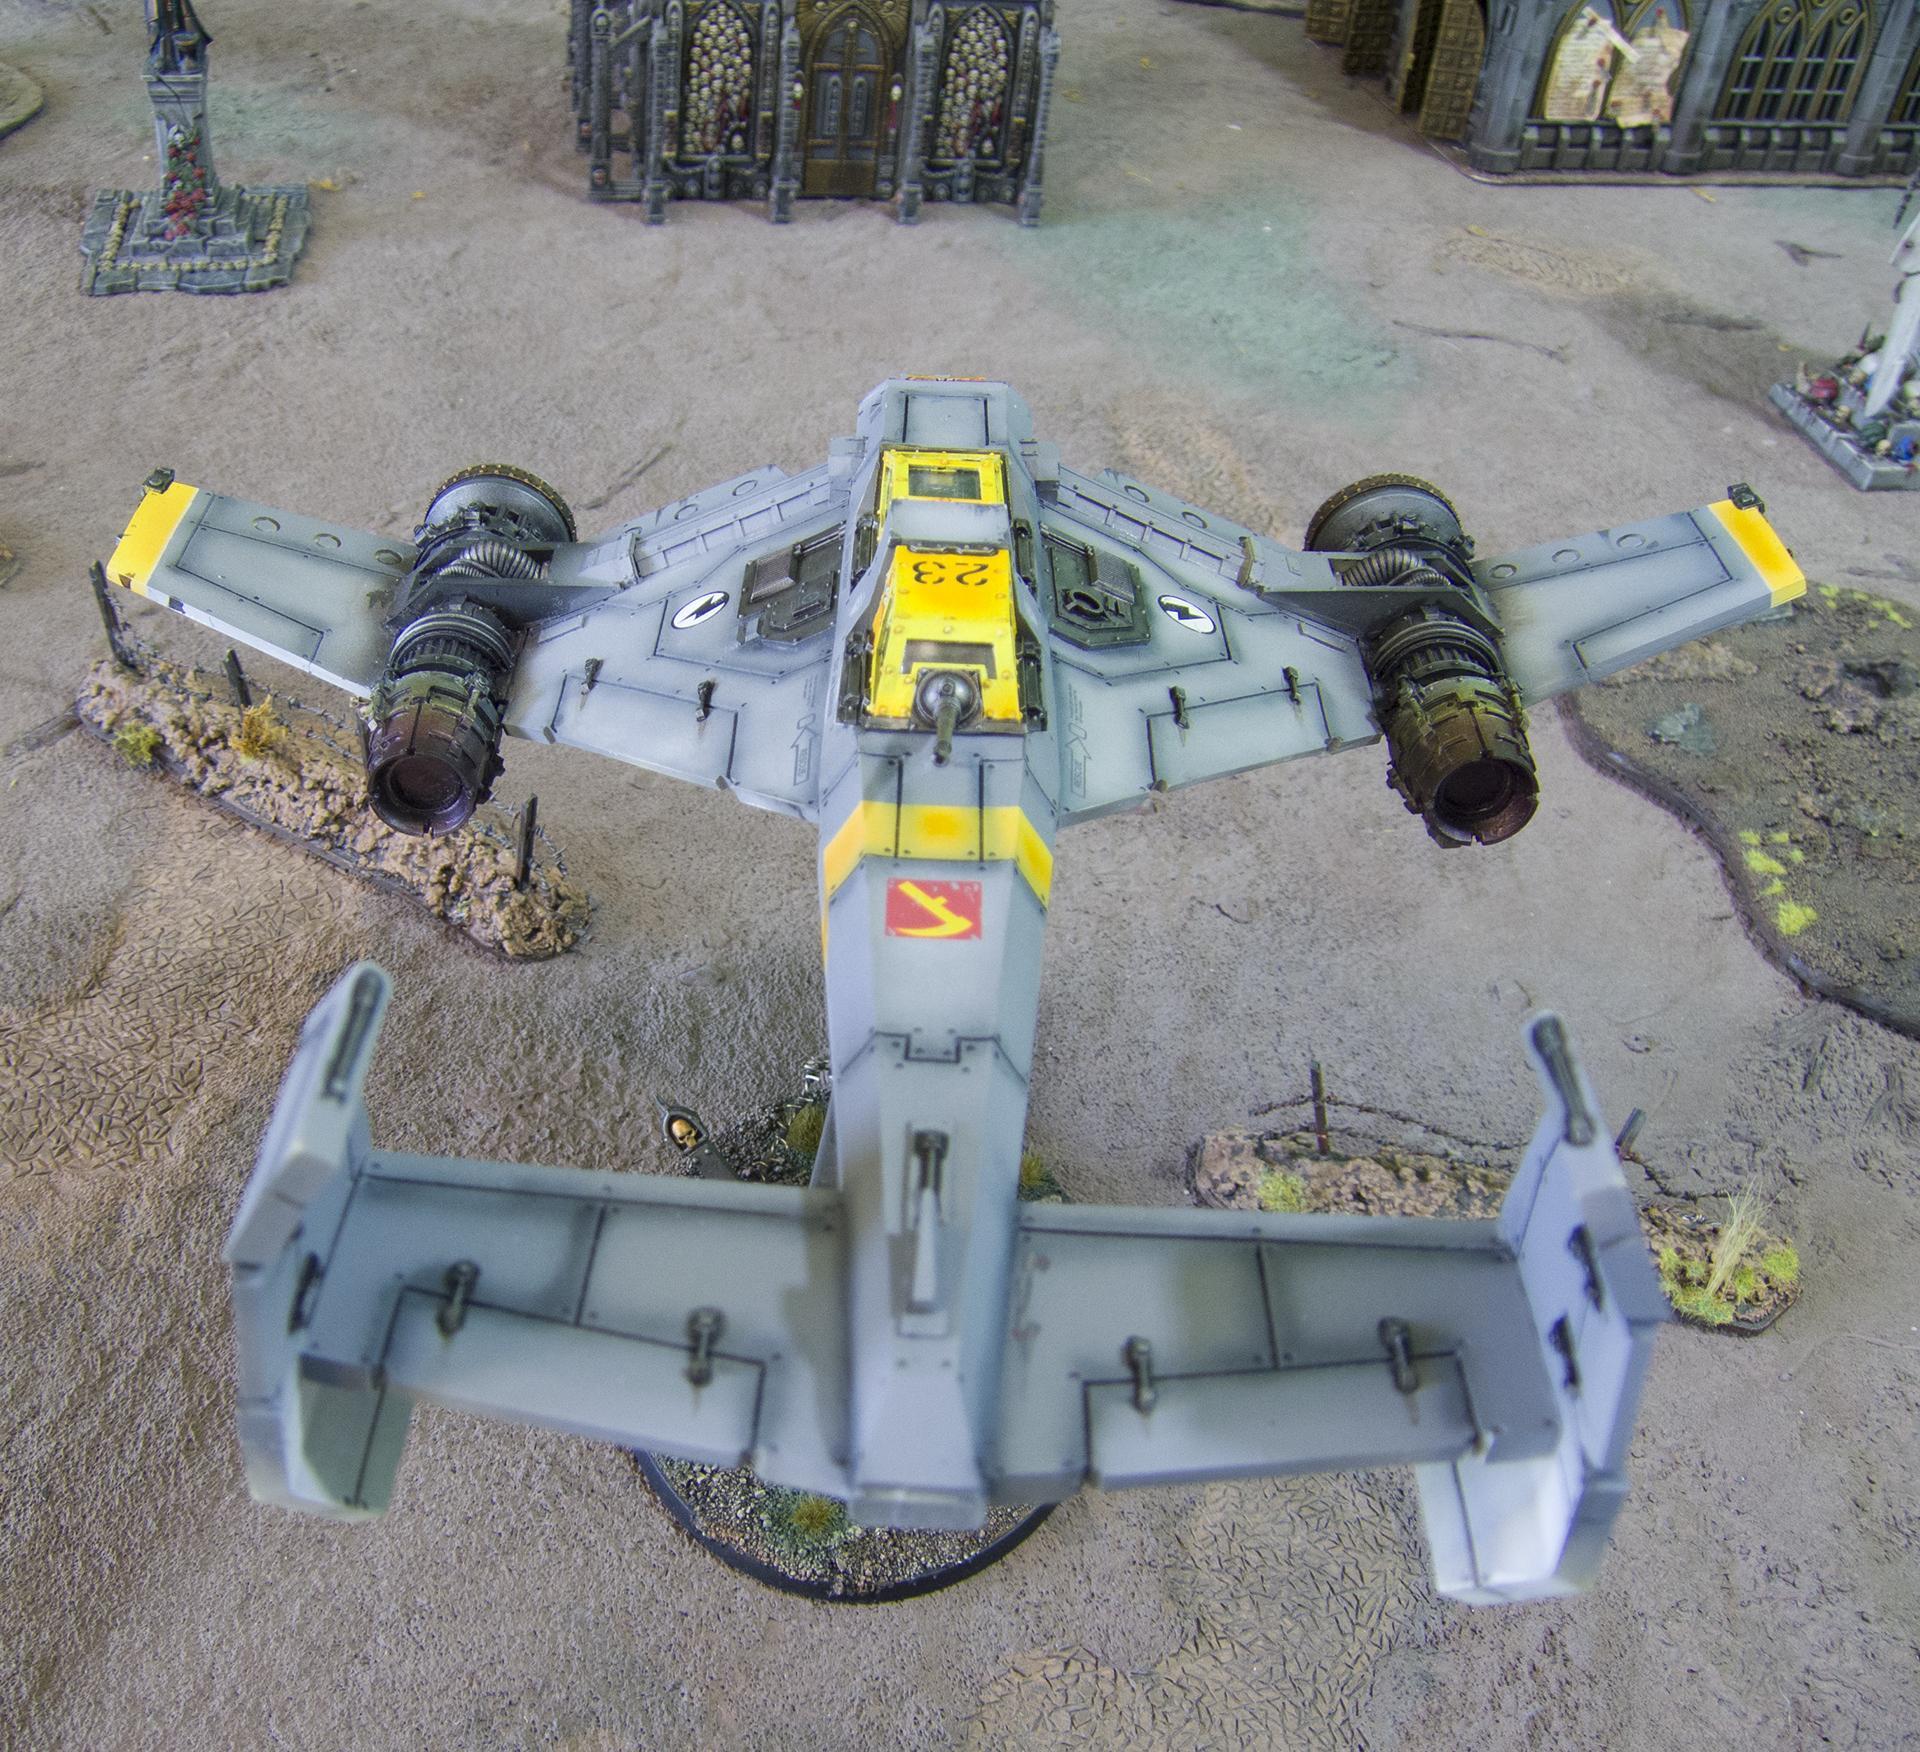 3d Print, 3d Printing, Aircraft, Avenger, Avenger Strike Fighter, Flyer, Forge World, Imperial Navy